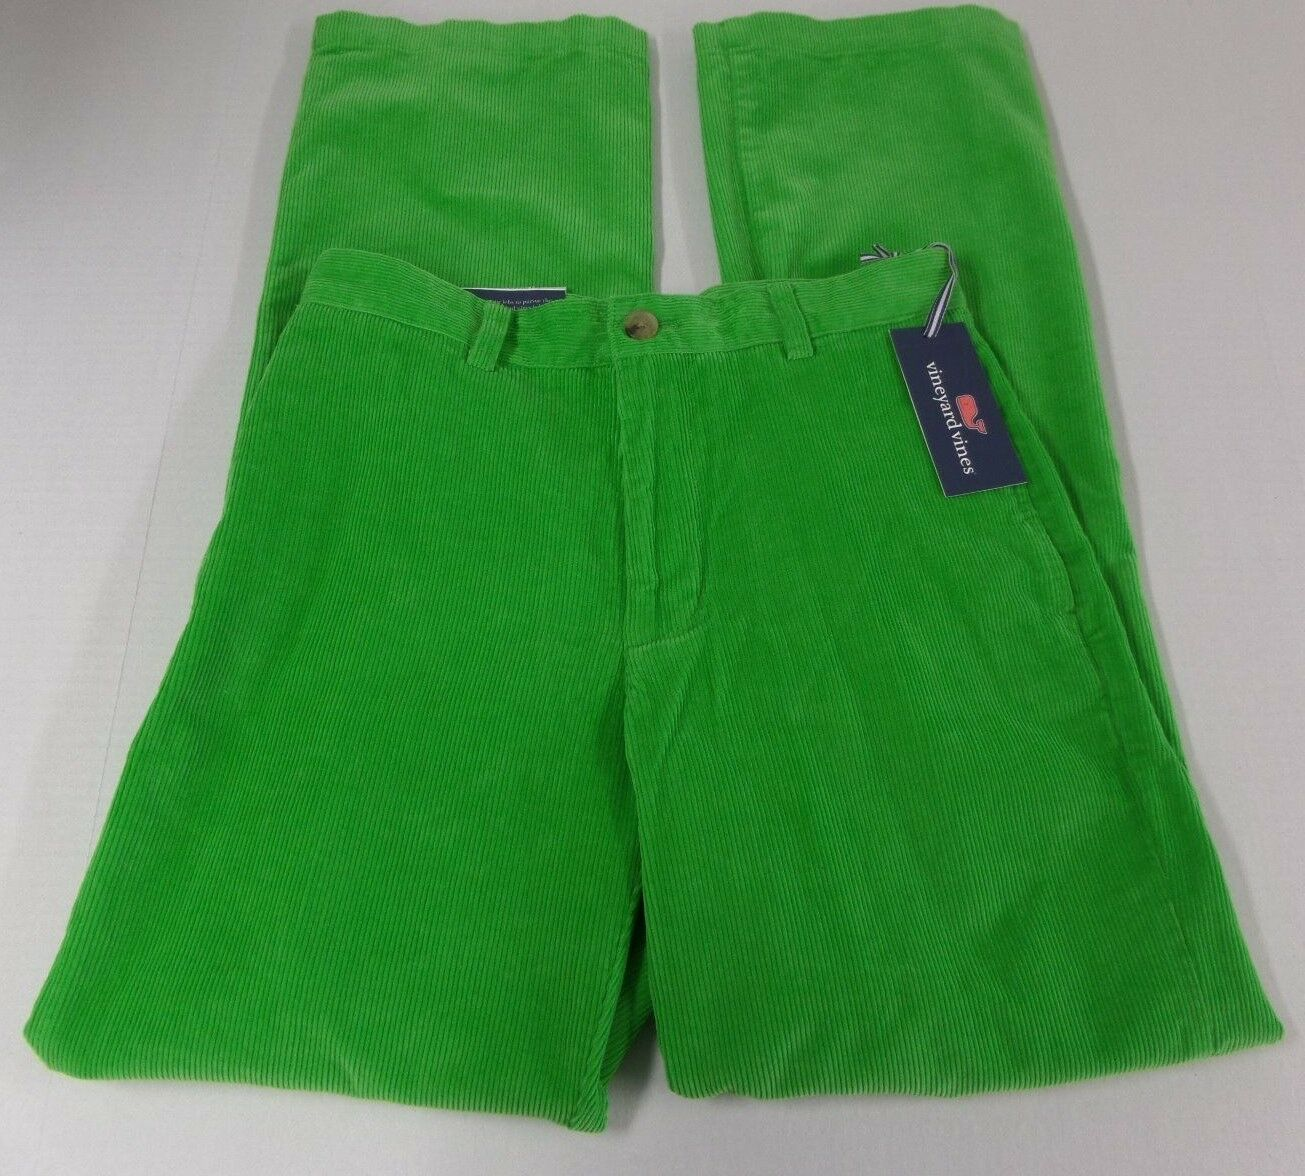 New Vineyard Vines Club Classic Fit Corduroy Pants Mens Size 28x32 Retail 98.50